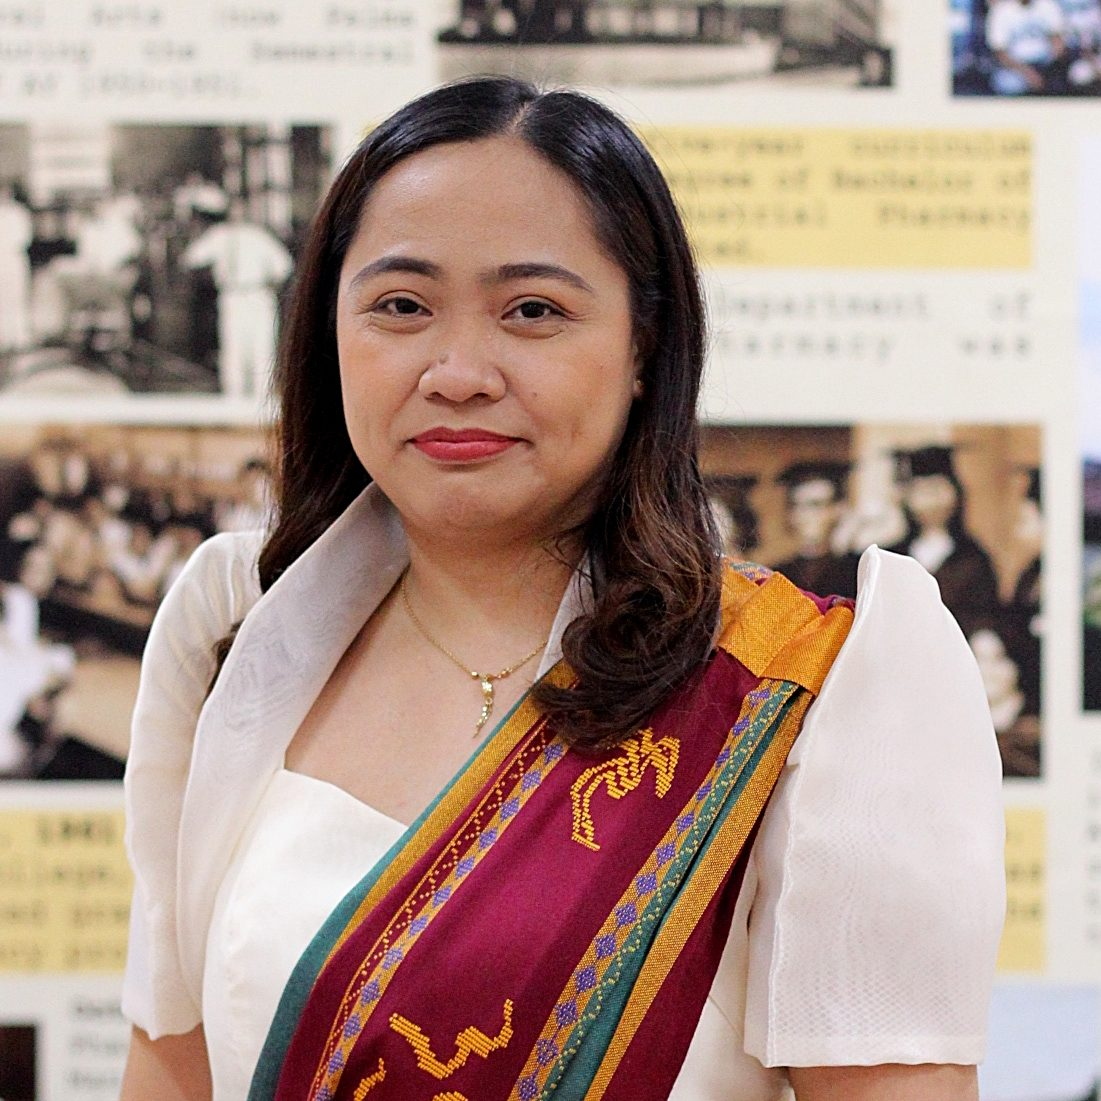 Shiela May J. Nacabu-an, MHPEd